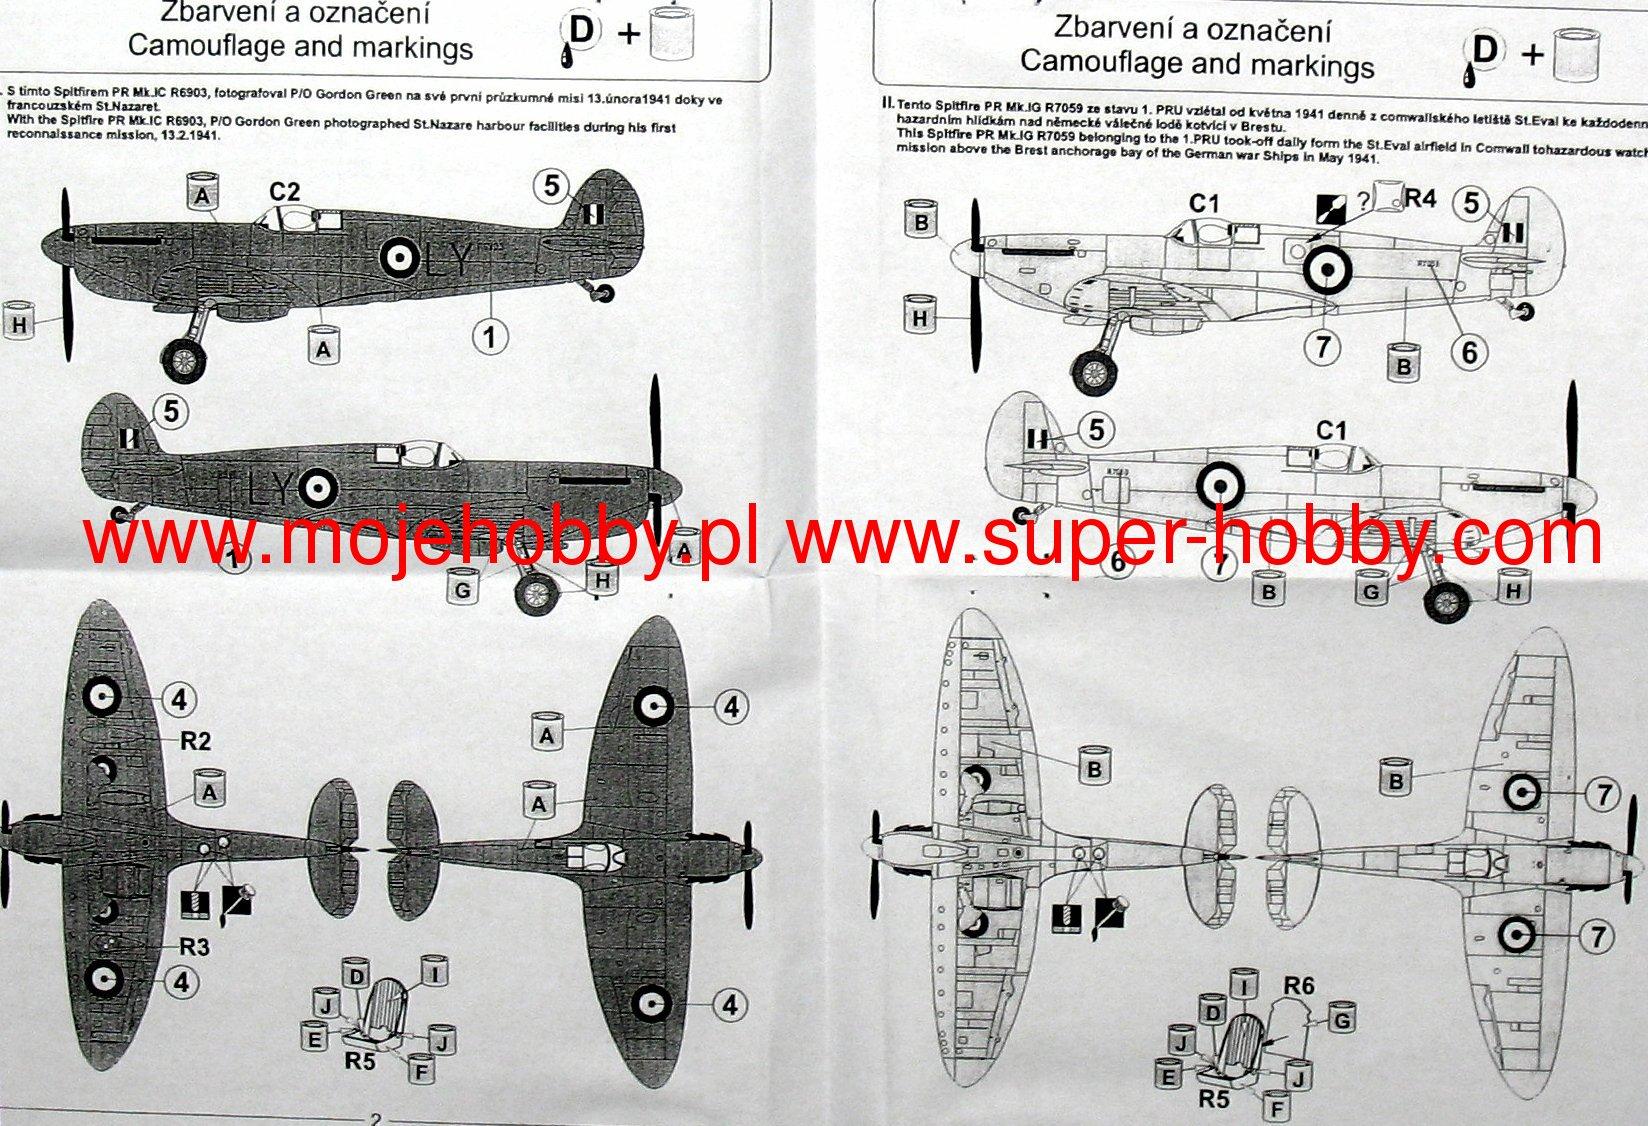 Pavla 1//48 Supermarine Spitfire PR Mk.IA Mk.VII Decal Sheet /& Canopies # Mk.IV